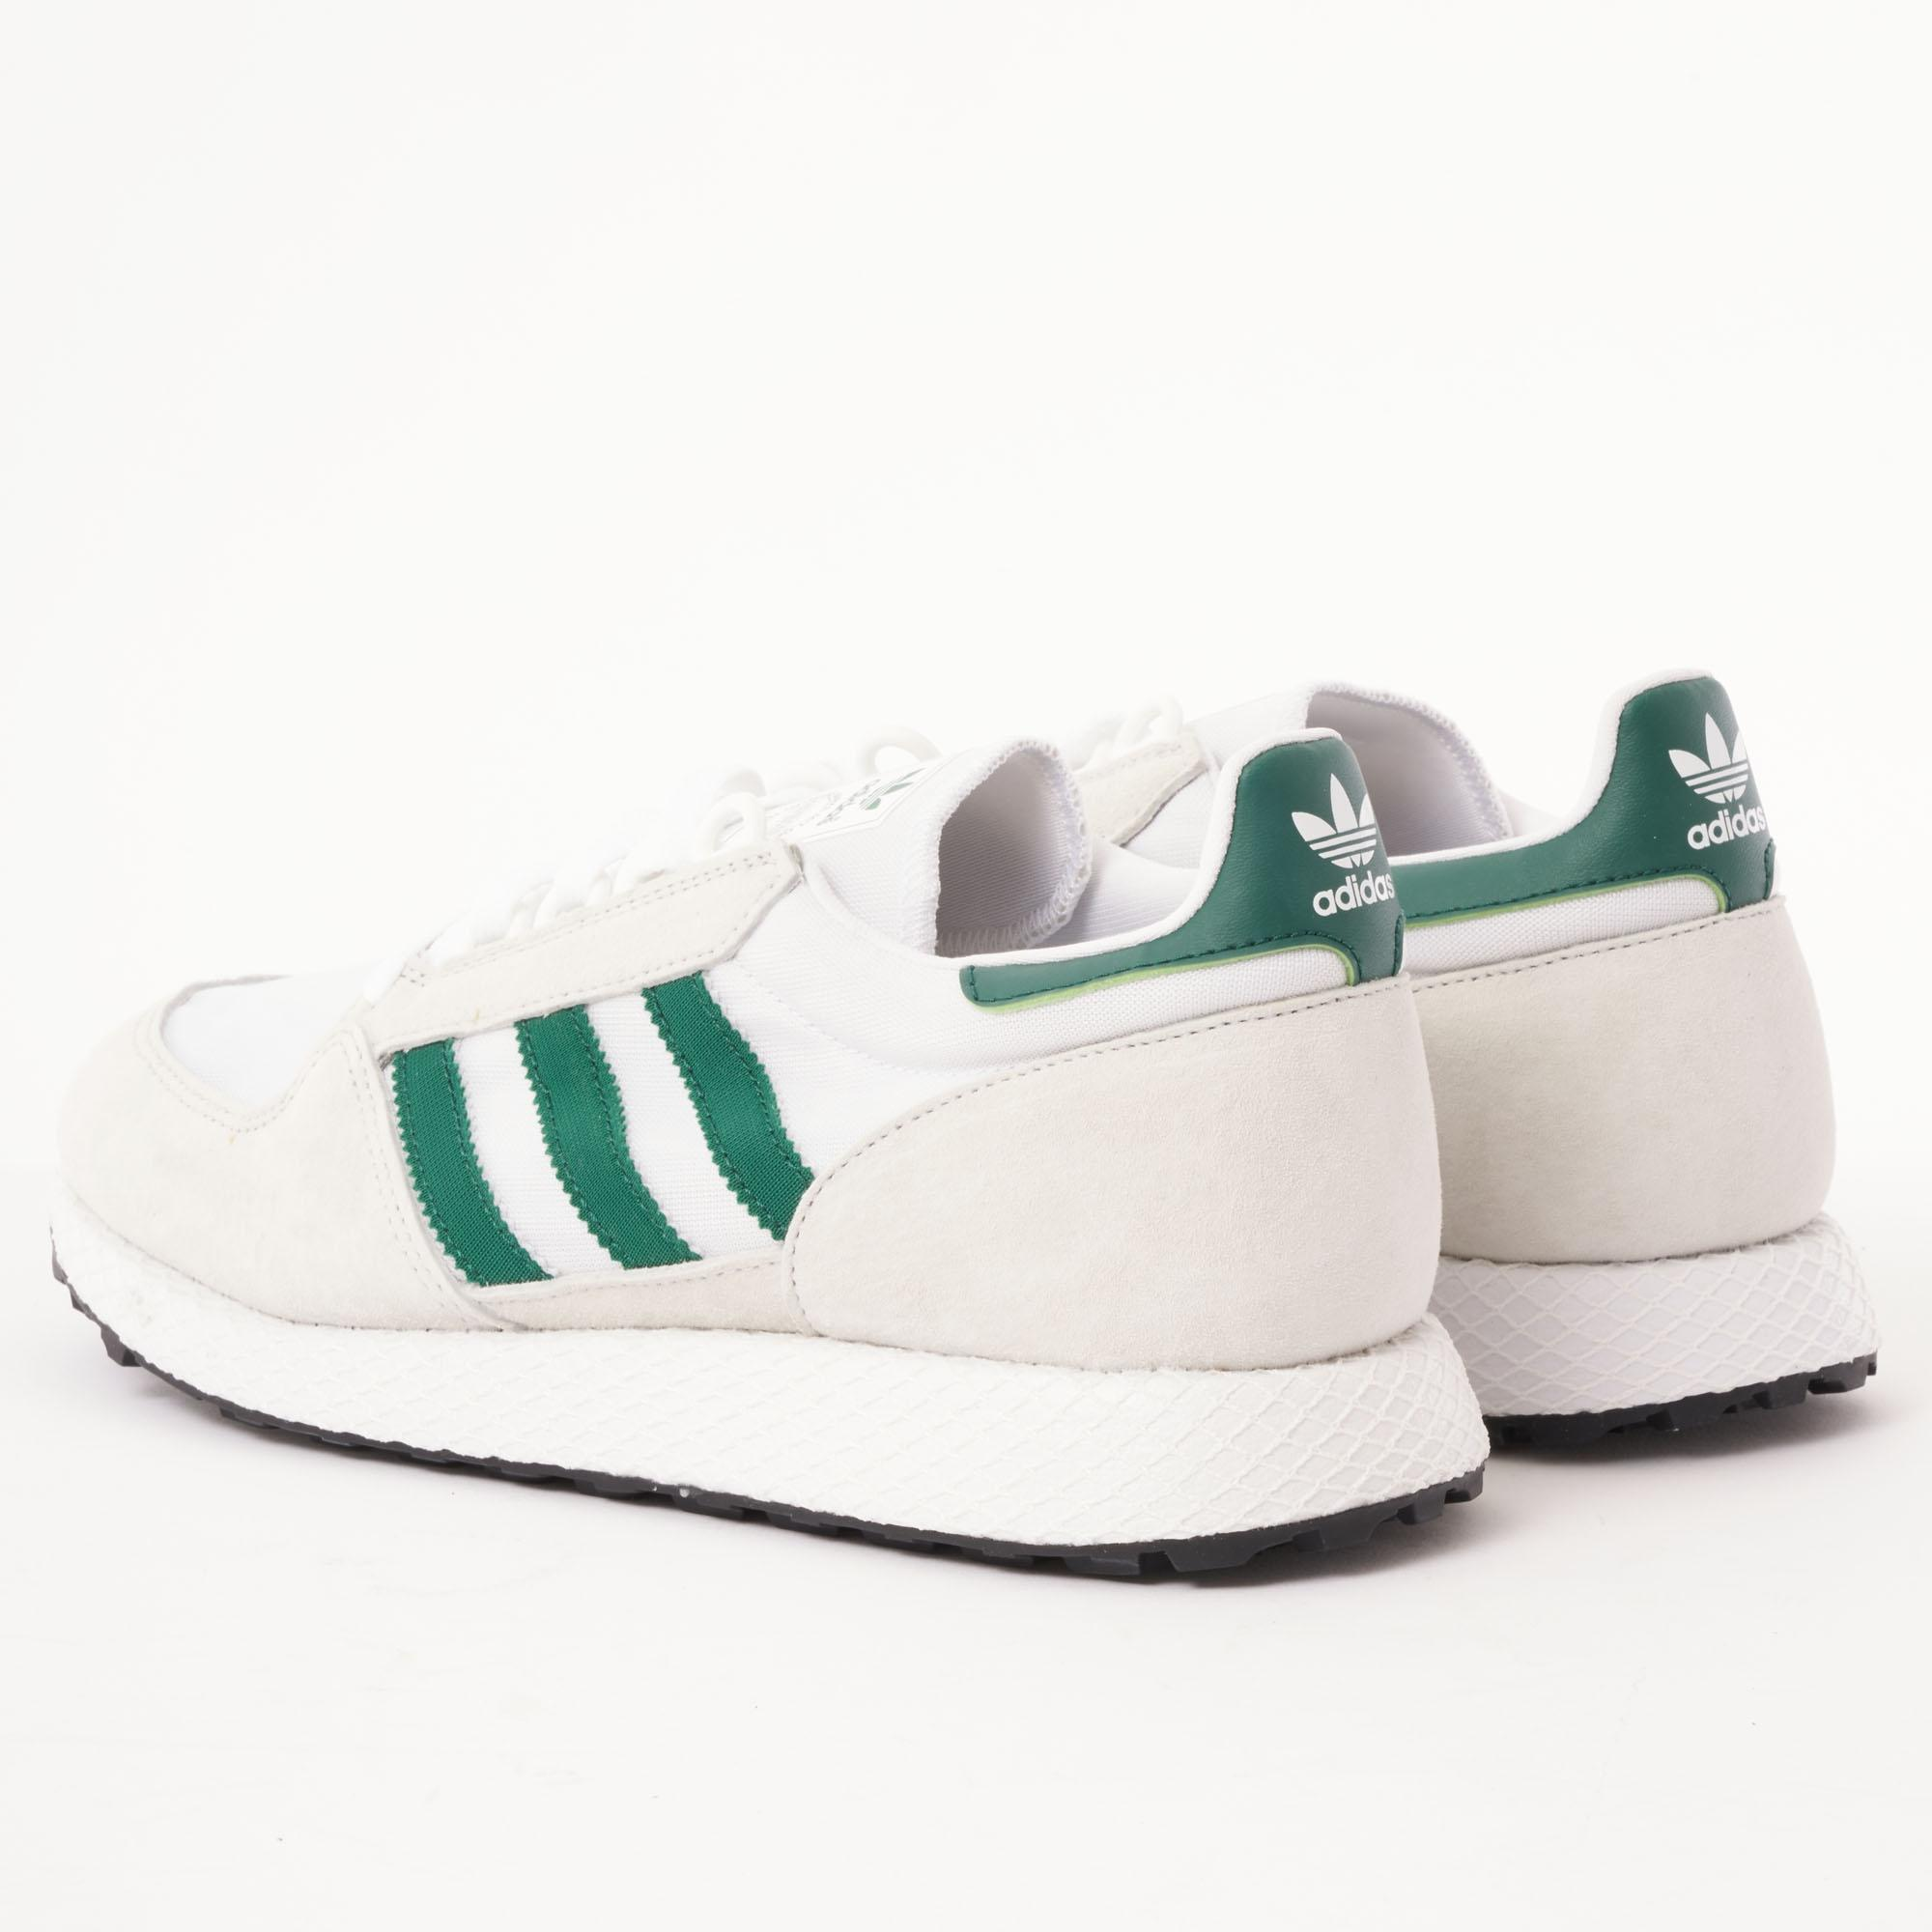 official photos d8b7f 7d434 Adidas Originals - Forest Grove - Crystal White, Collegiate Green  Core  Black for Men. View fullscreen